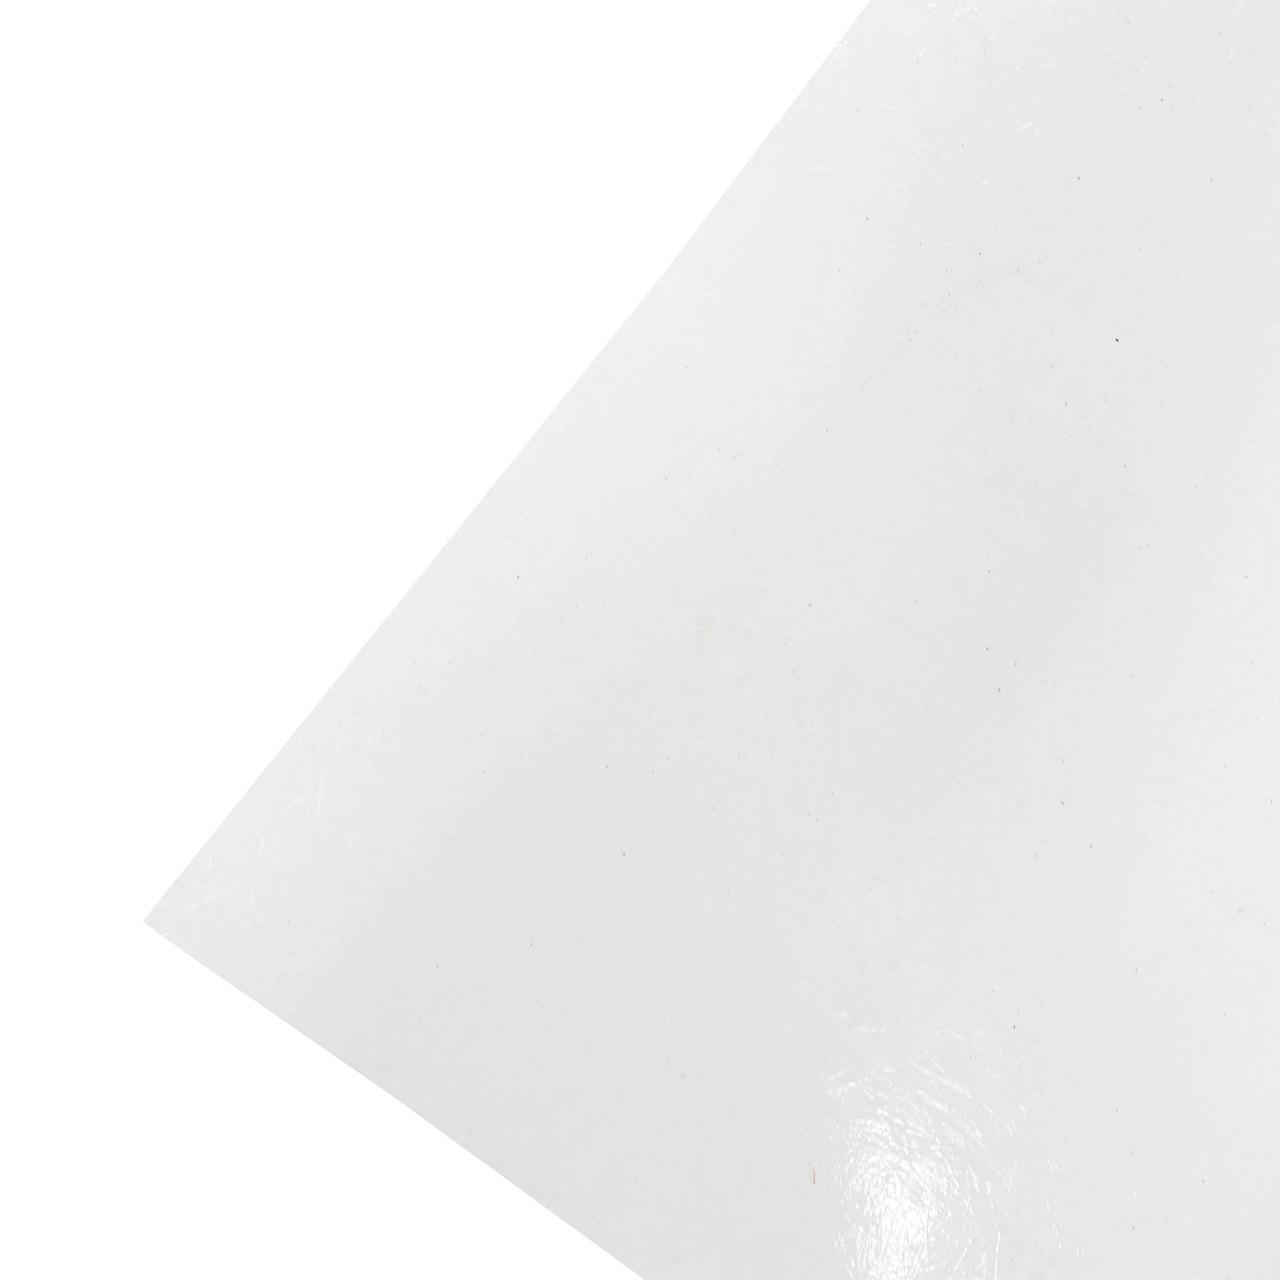 Arctic White RV Fiberglass/Filon Siding